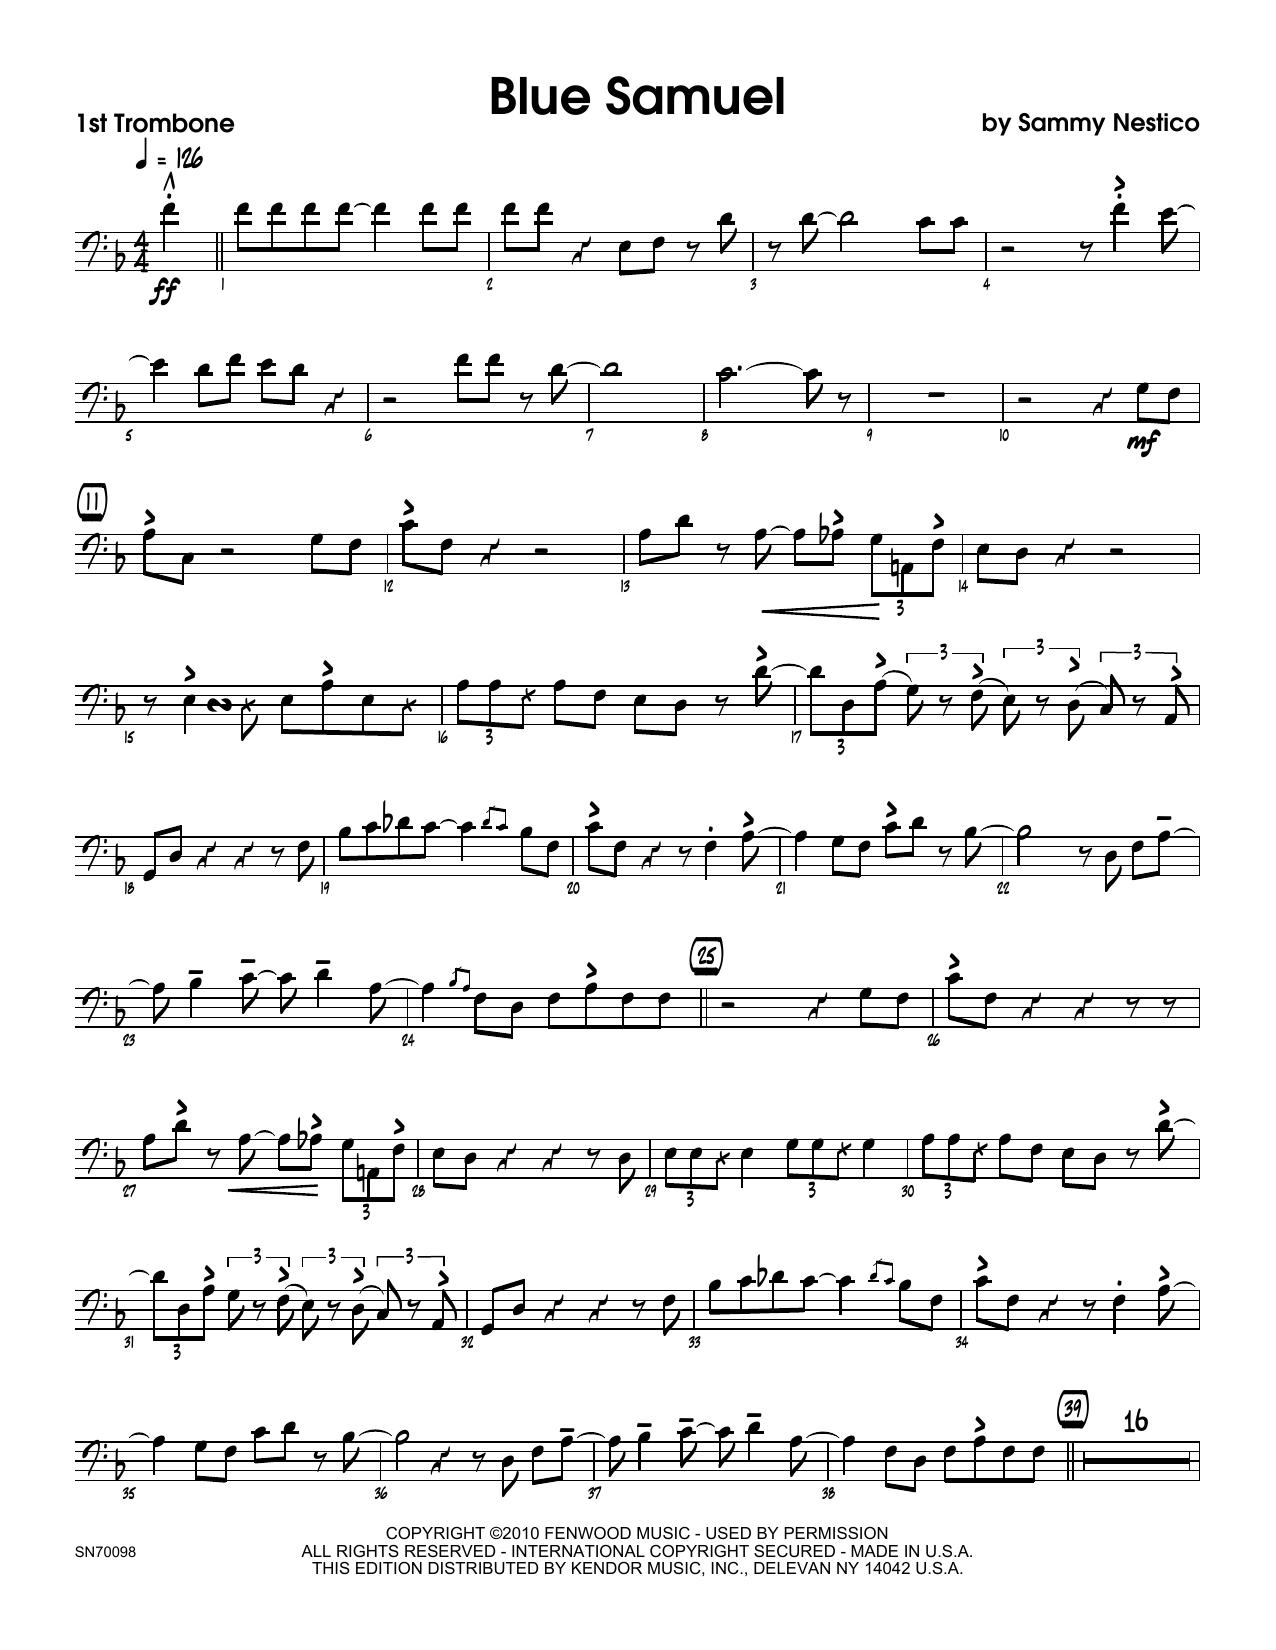 Blue Samuel - 1st Trombone Sheet Music